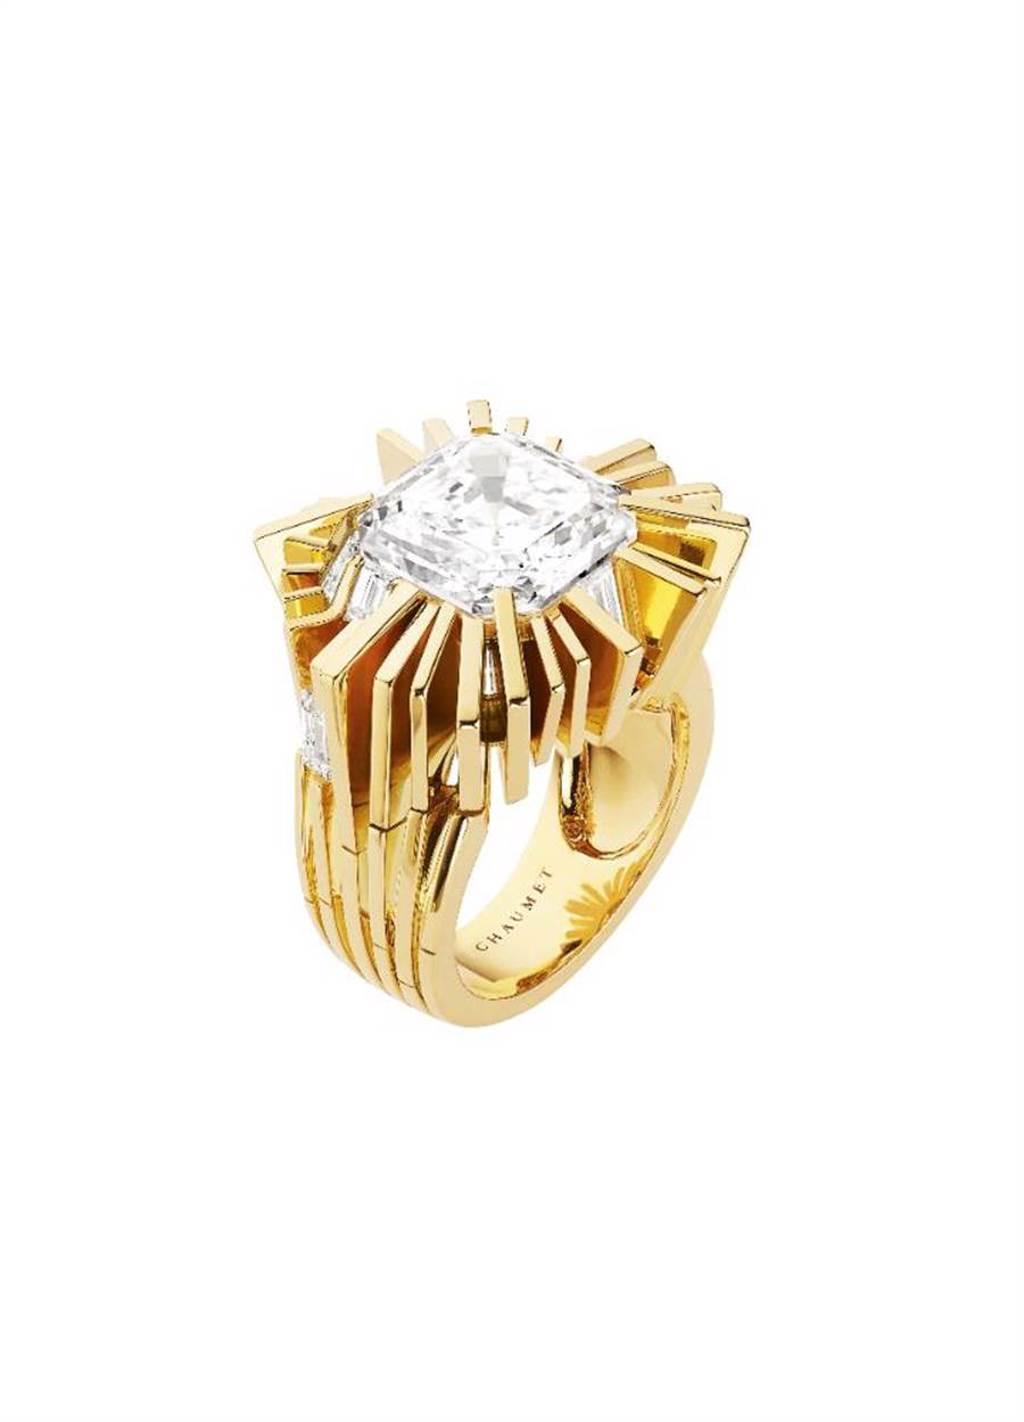 CHAUMET Skyline黃K金戒指,以高聳入雲的摩天大樓為靈感打造戒檯,烘托7.34克拉的鑽石,約4500萬元。(CHAUMET提供)